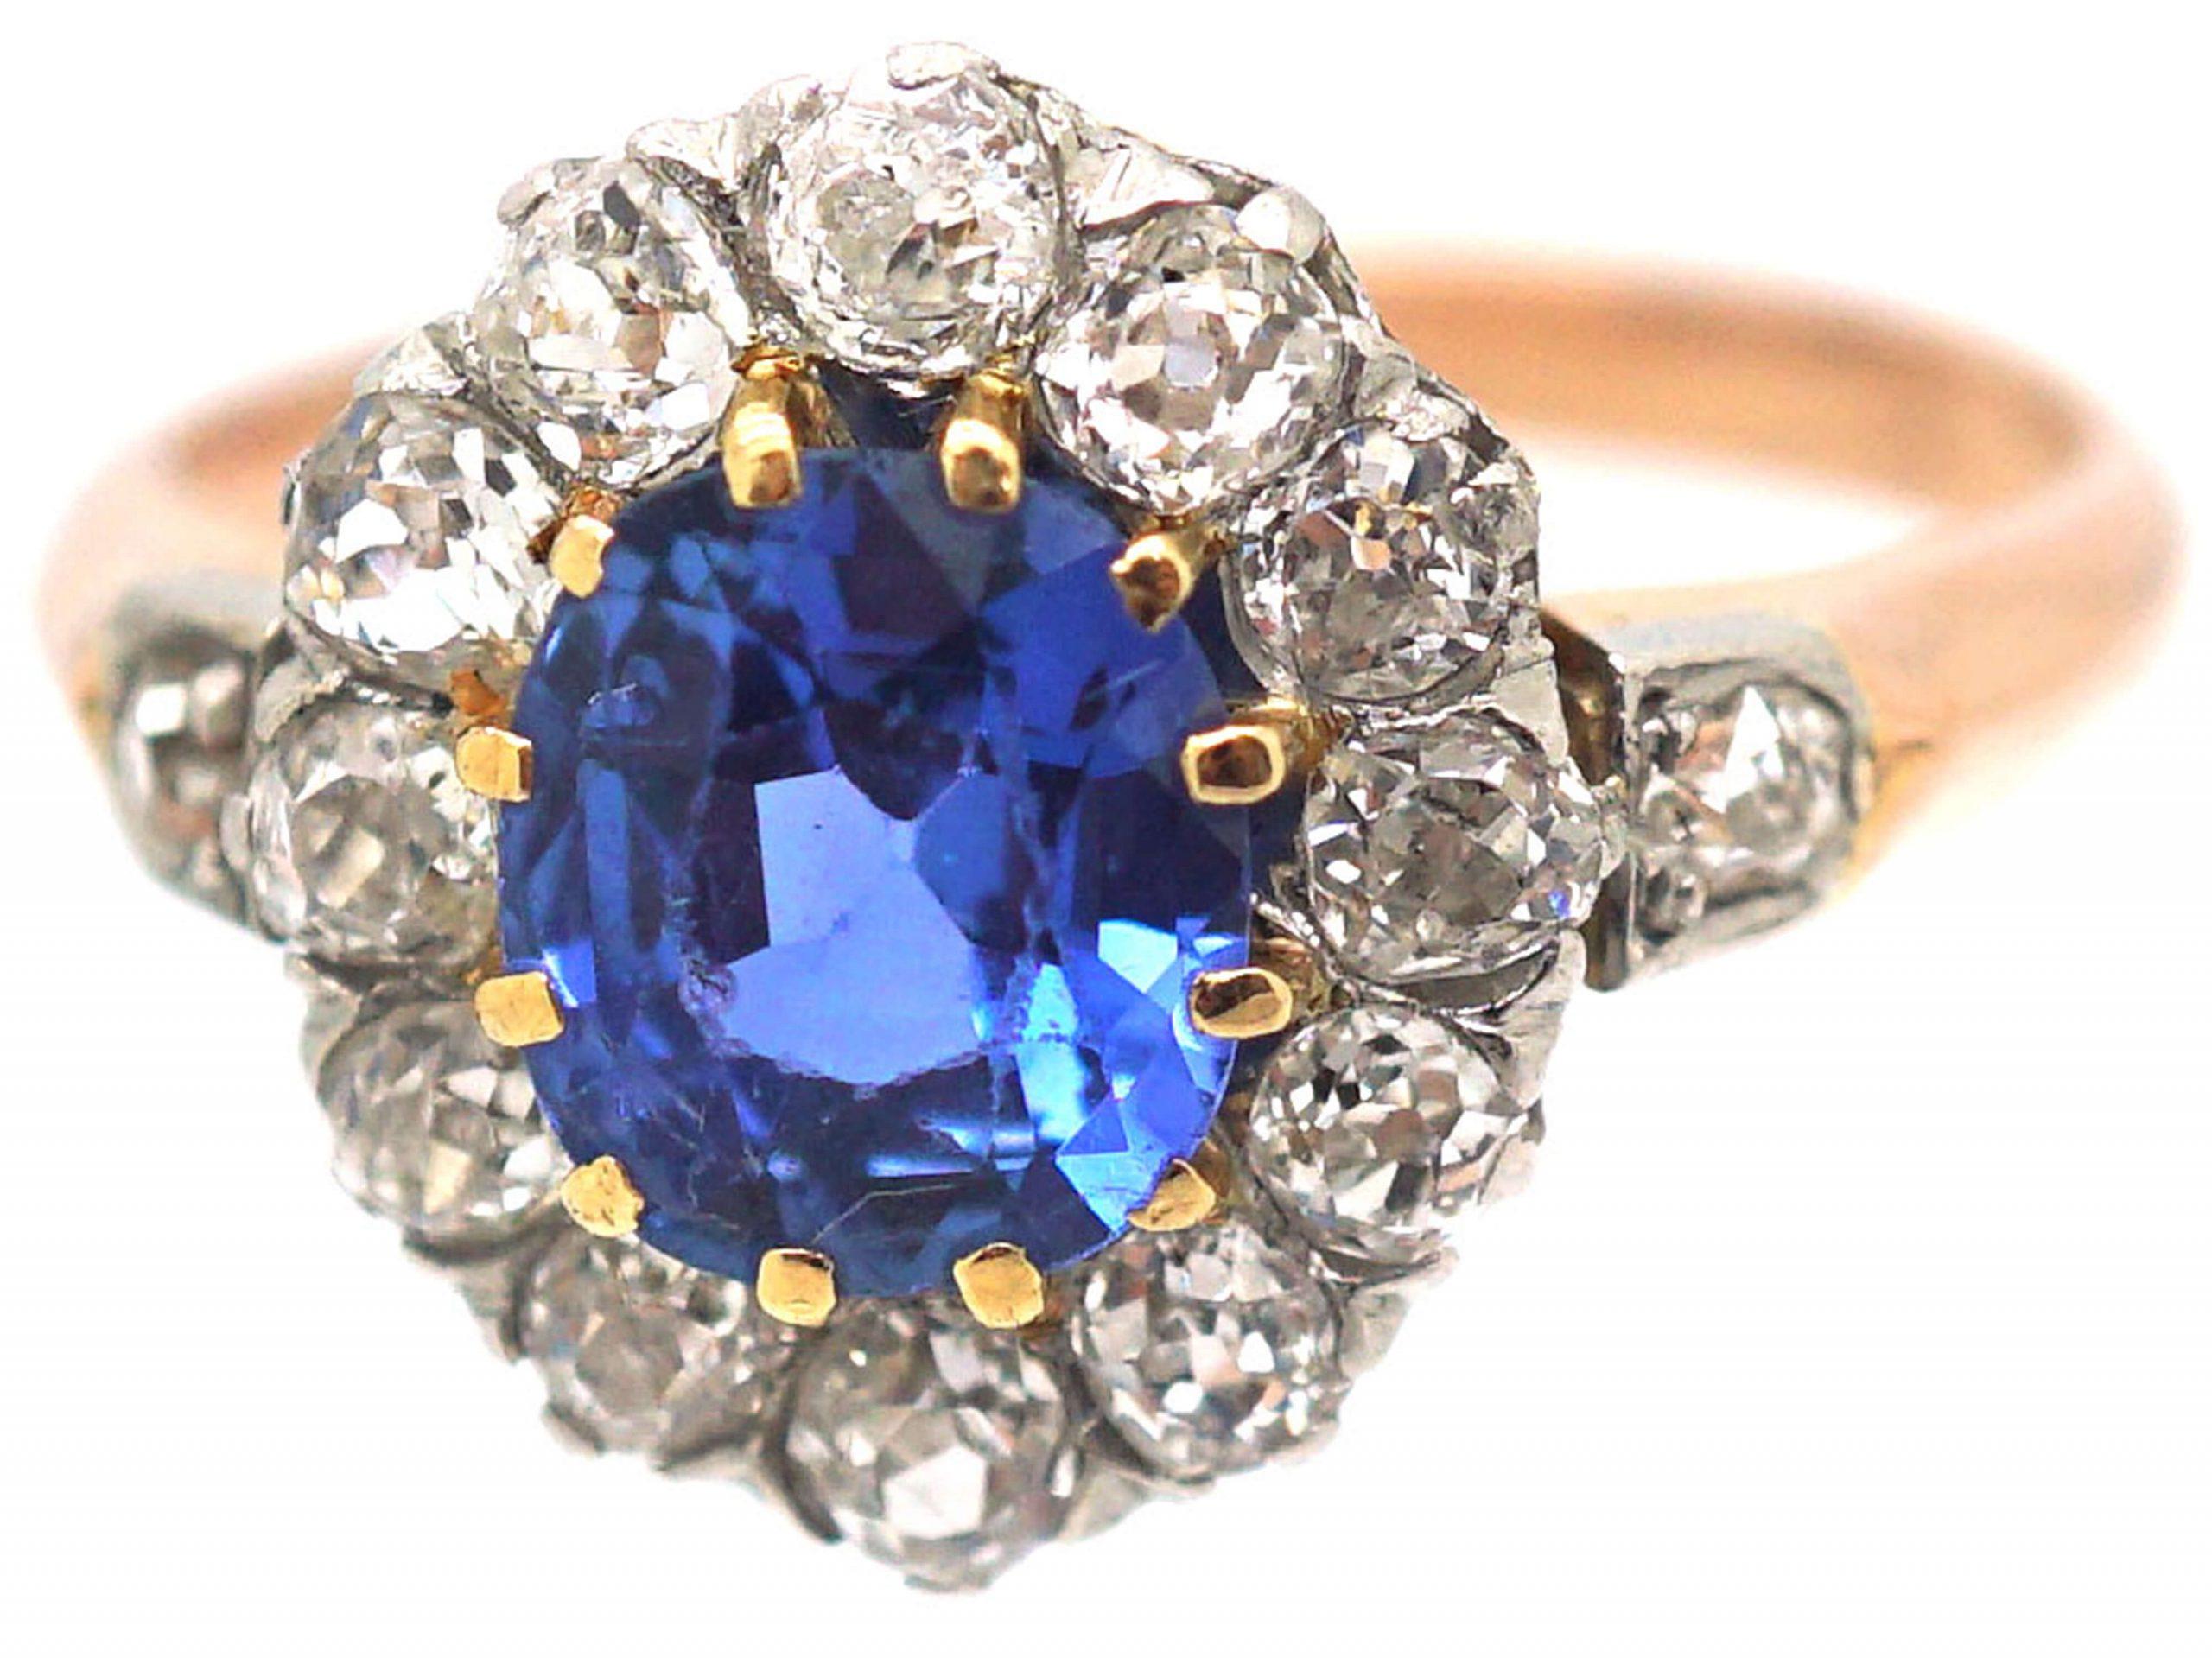 French Belle Epoque 18ct Gold, Platinum, Ceylon Sapphire & Diamond Cluster Ring with Diamond Set Shoulders